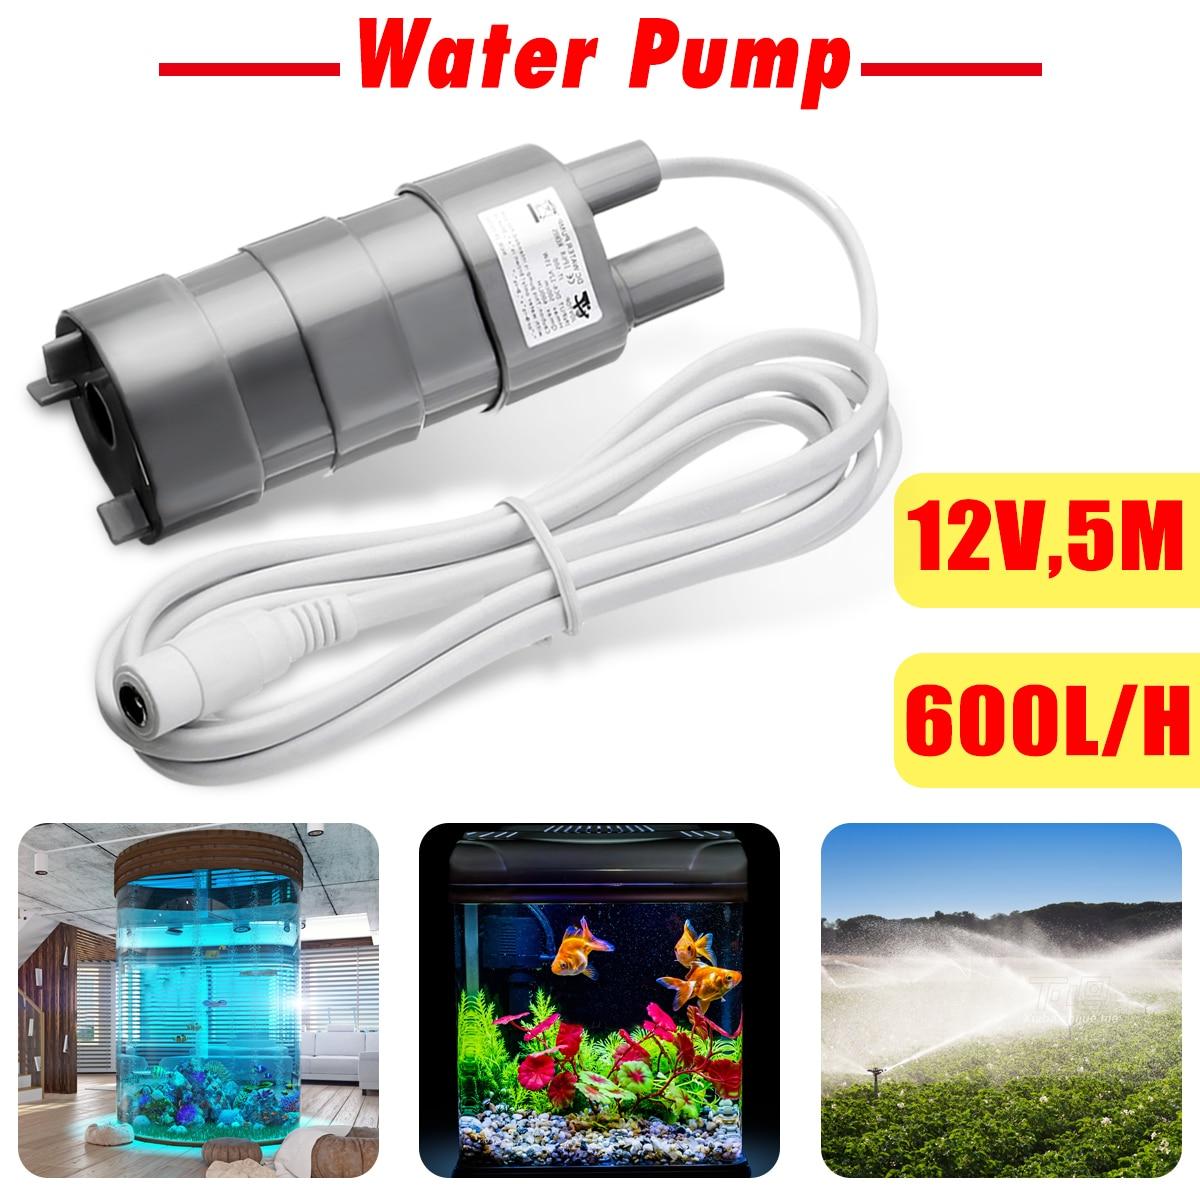 12V Solar Brushless Magnetic Submersible Water Pump 5M 600L/H Garden Fish Pond